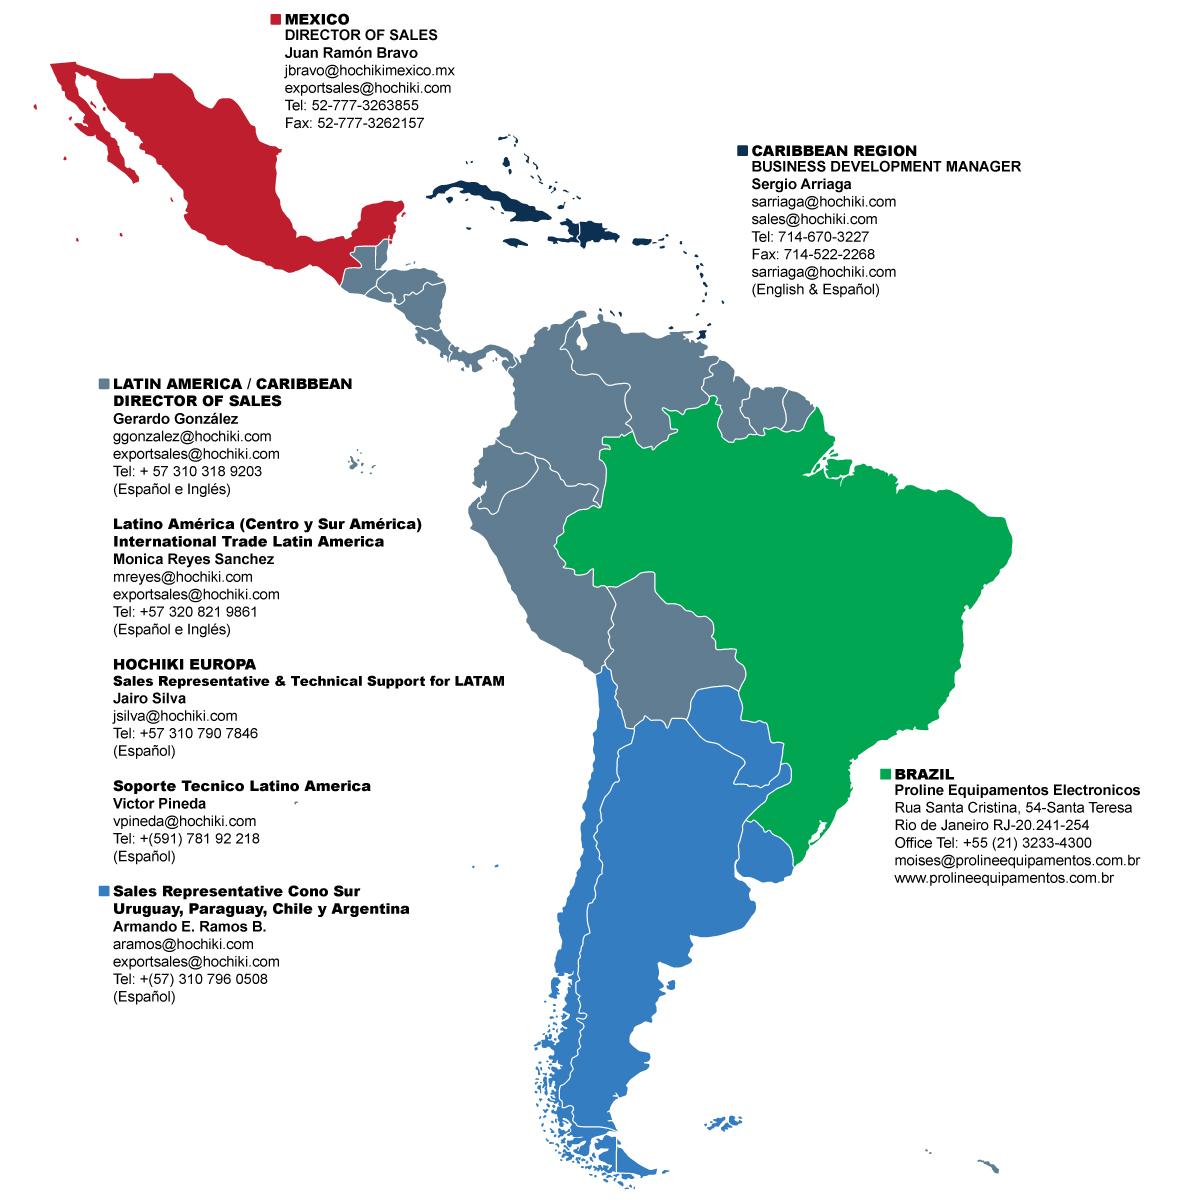 Sales_Territories_Map_2019